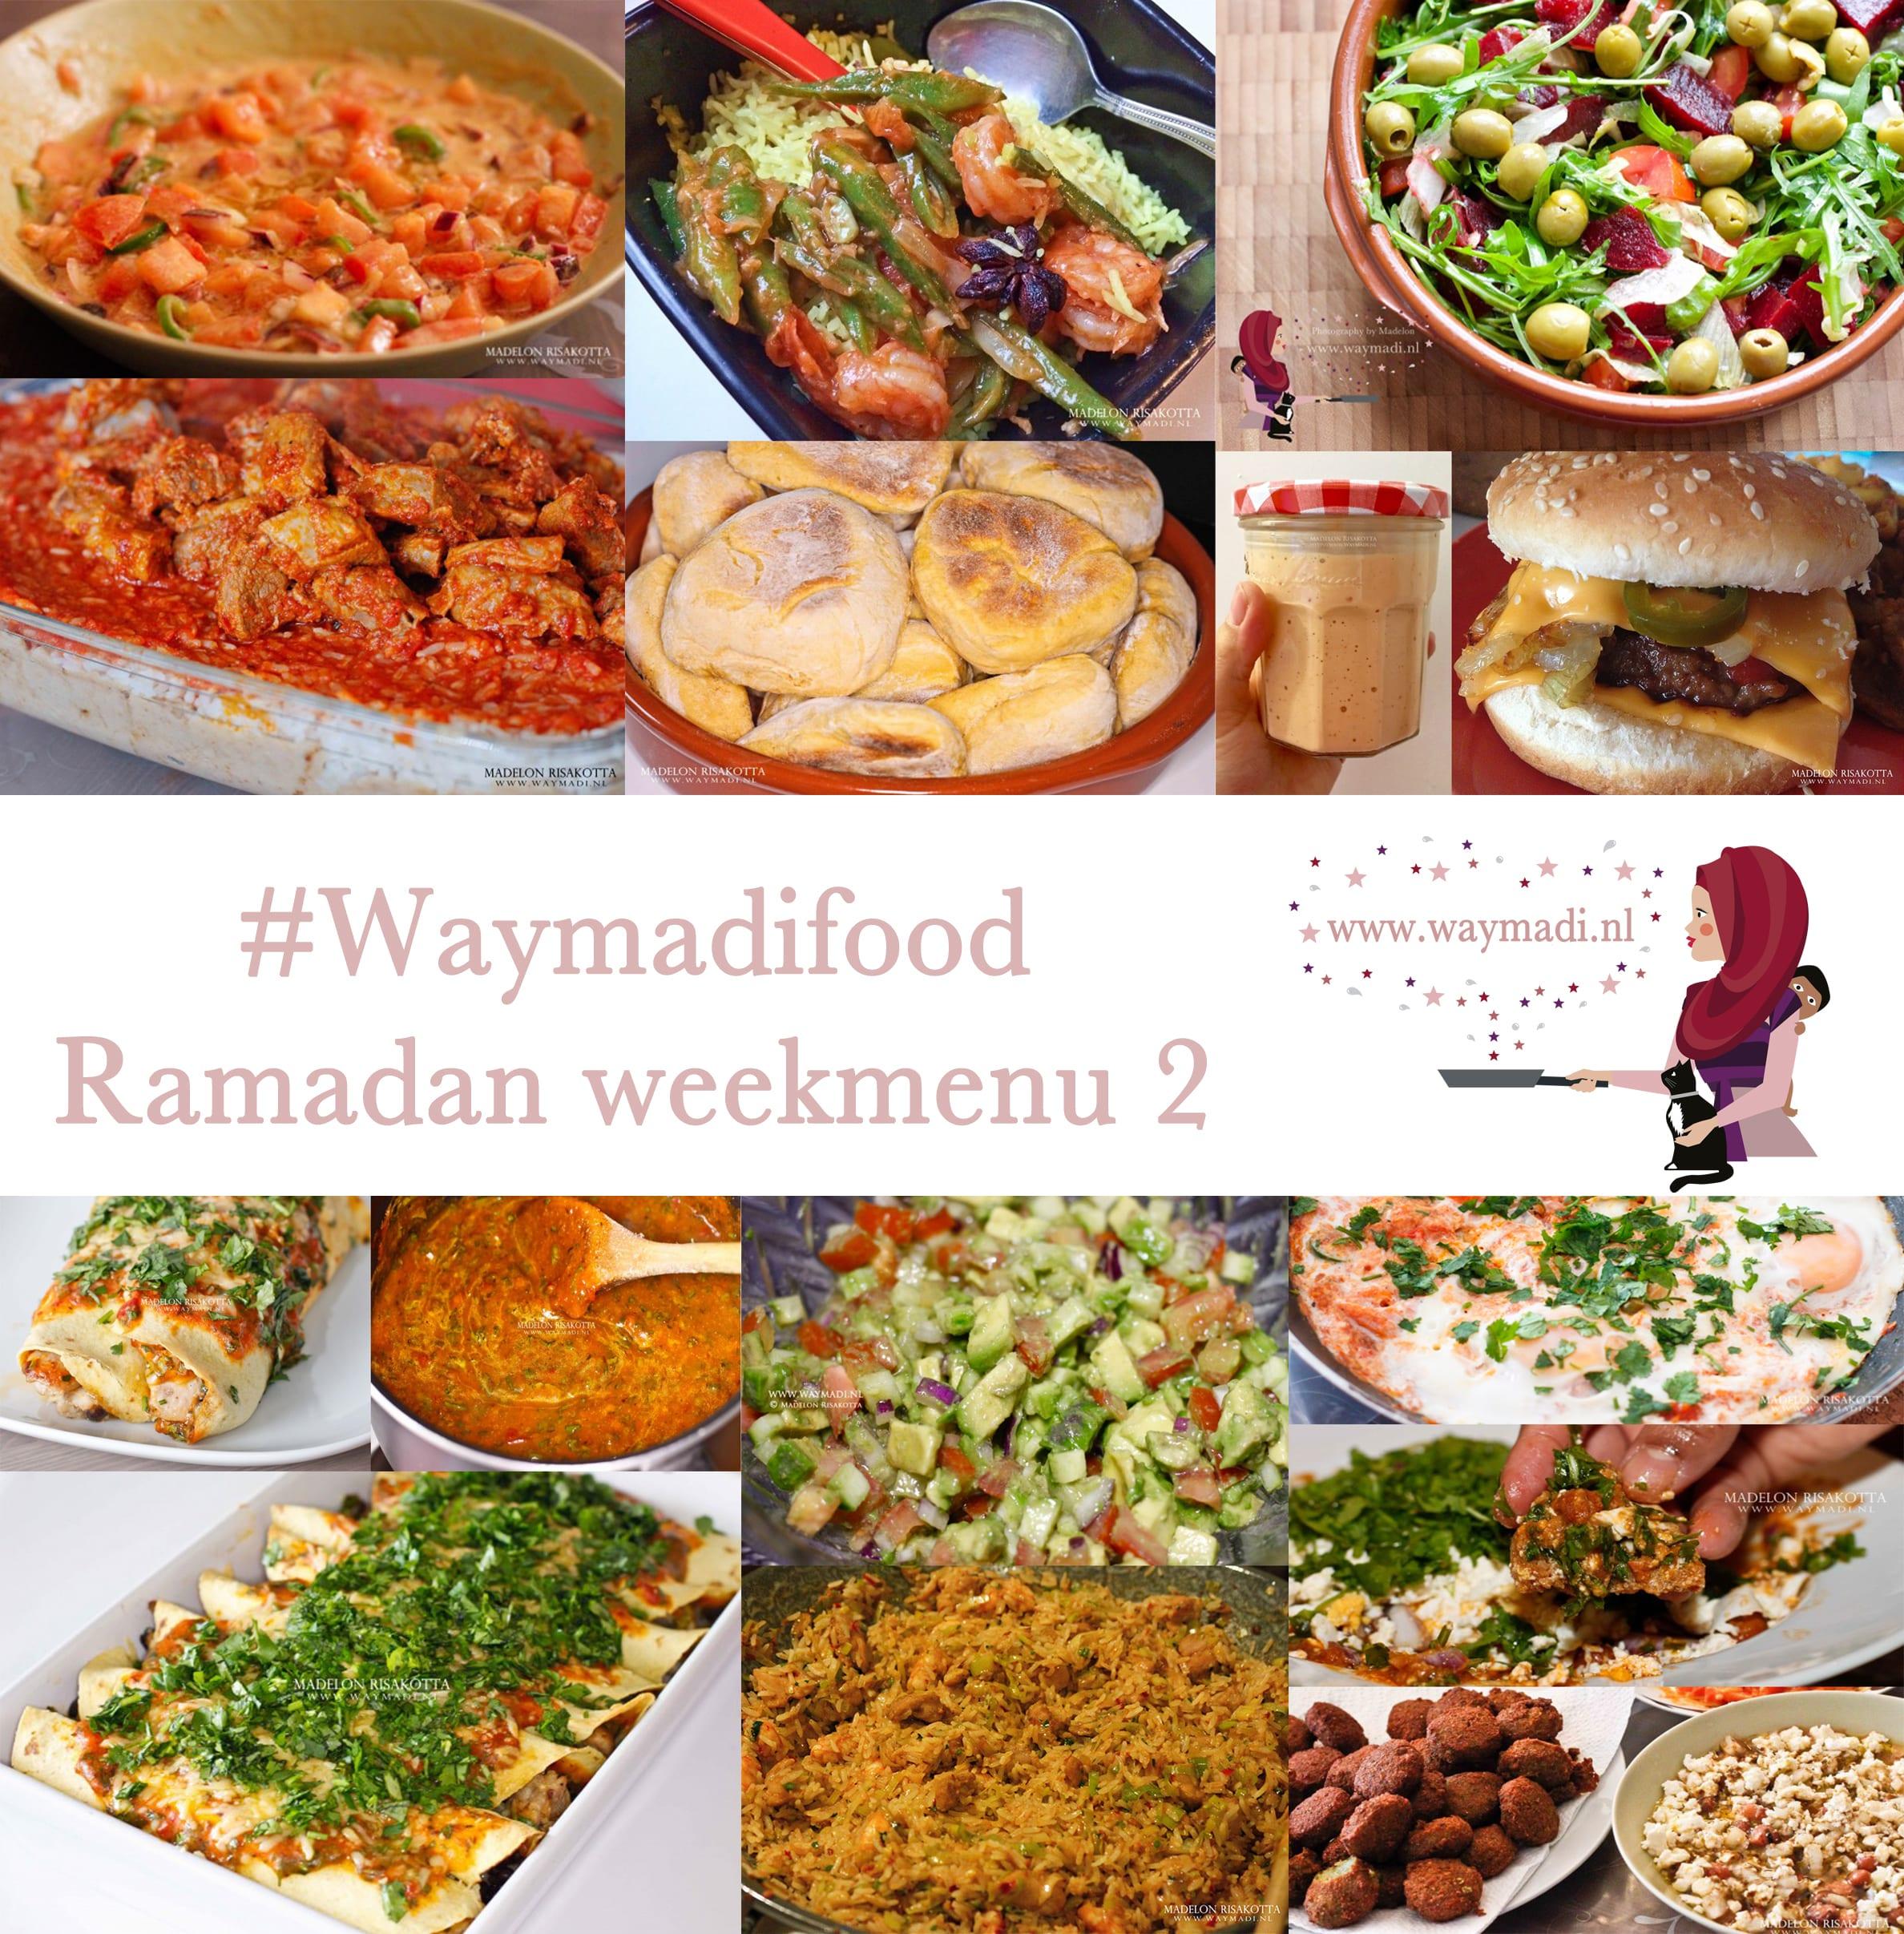 Ramadan weekmenu 2